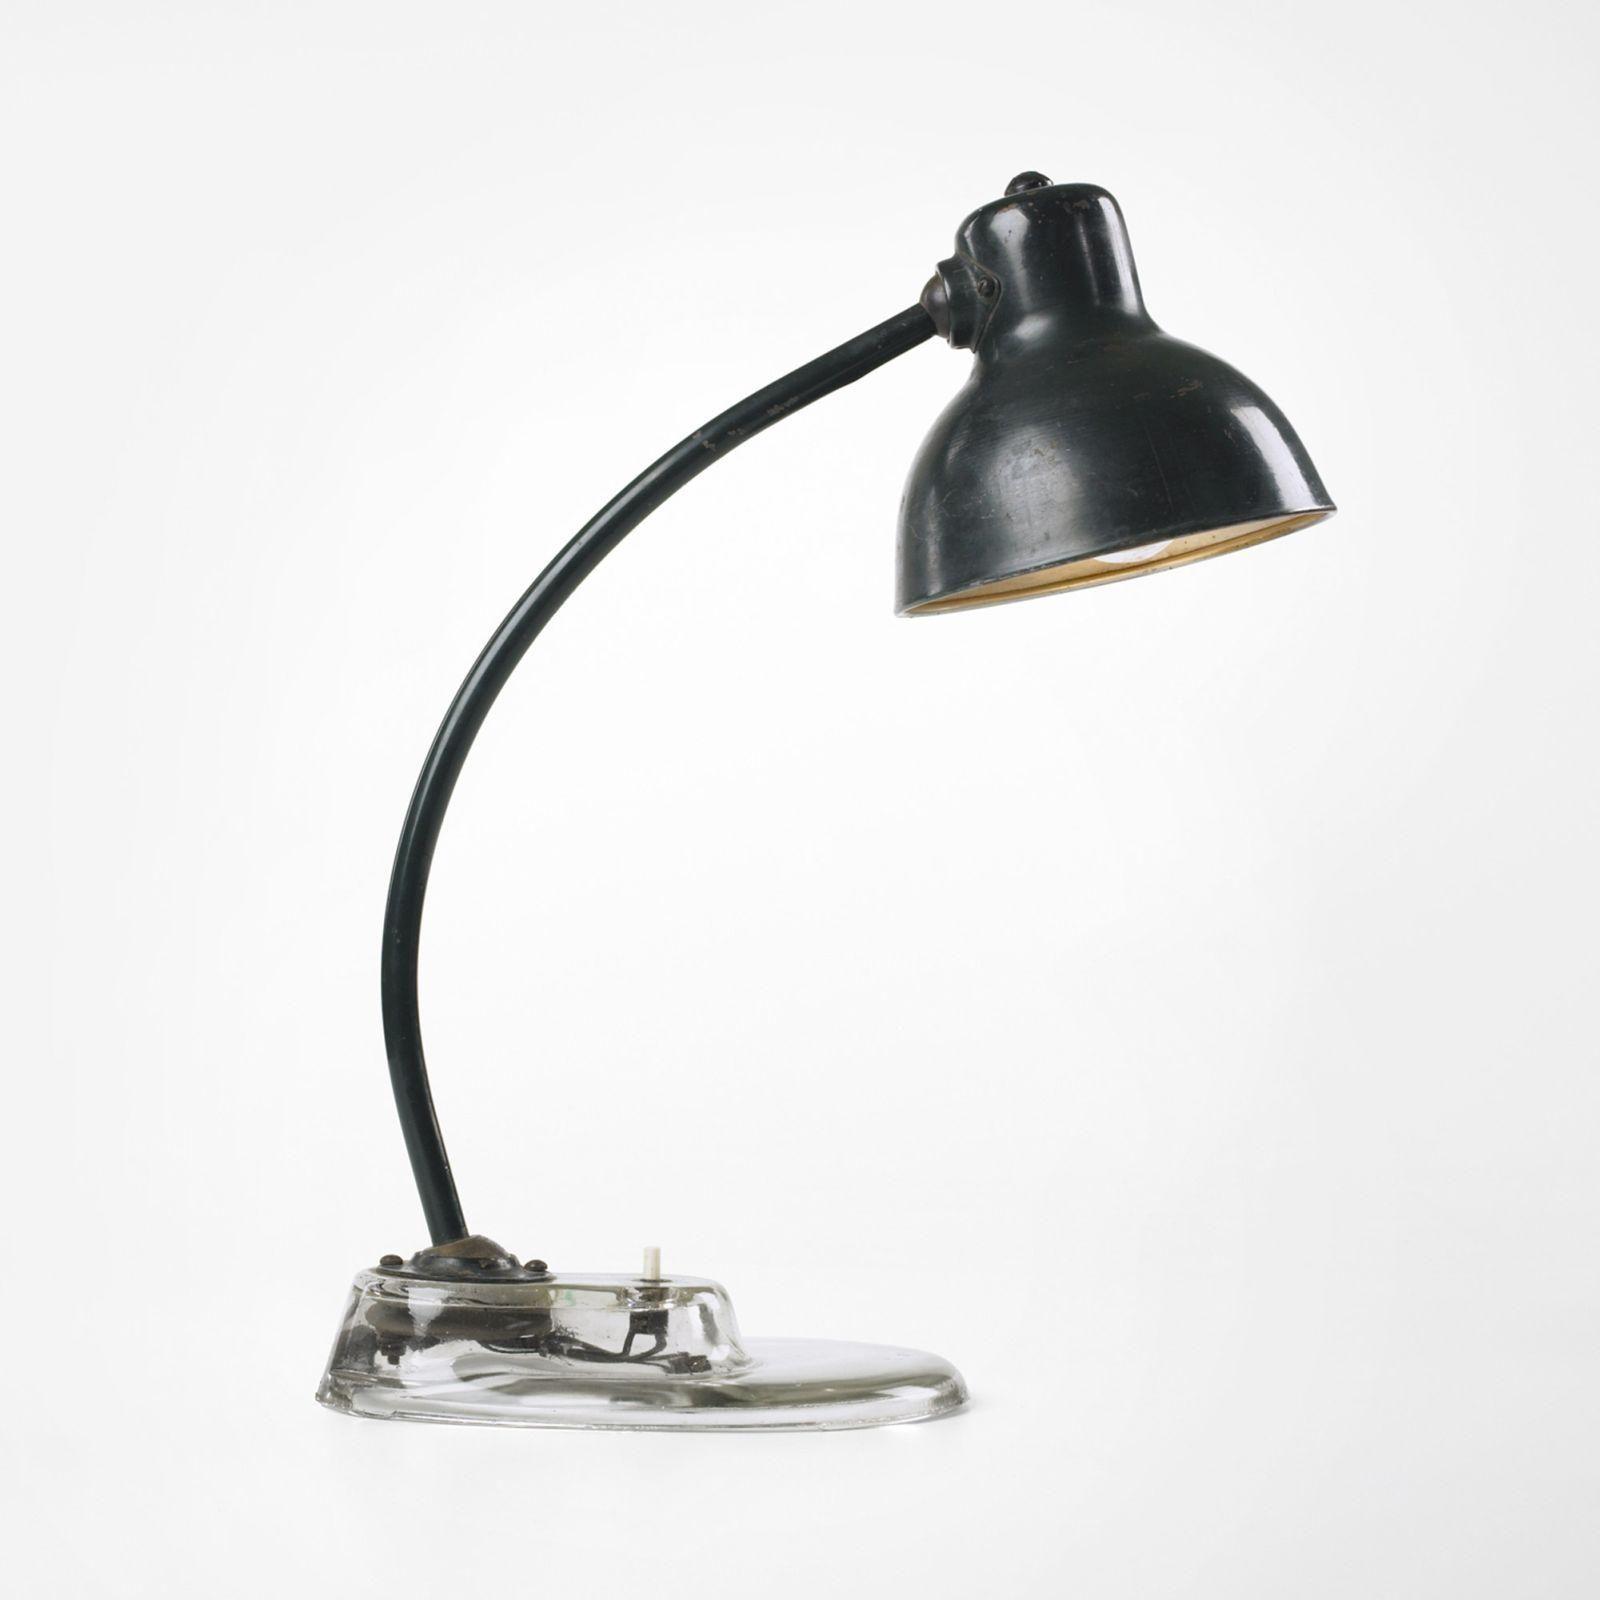 Bauhaus pendant lamp marianne brandt and hans przyrembel 1925 - Find This Pin And More On Bauhaus Marianne Brandt